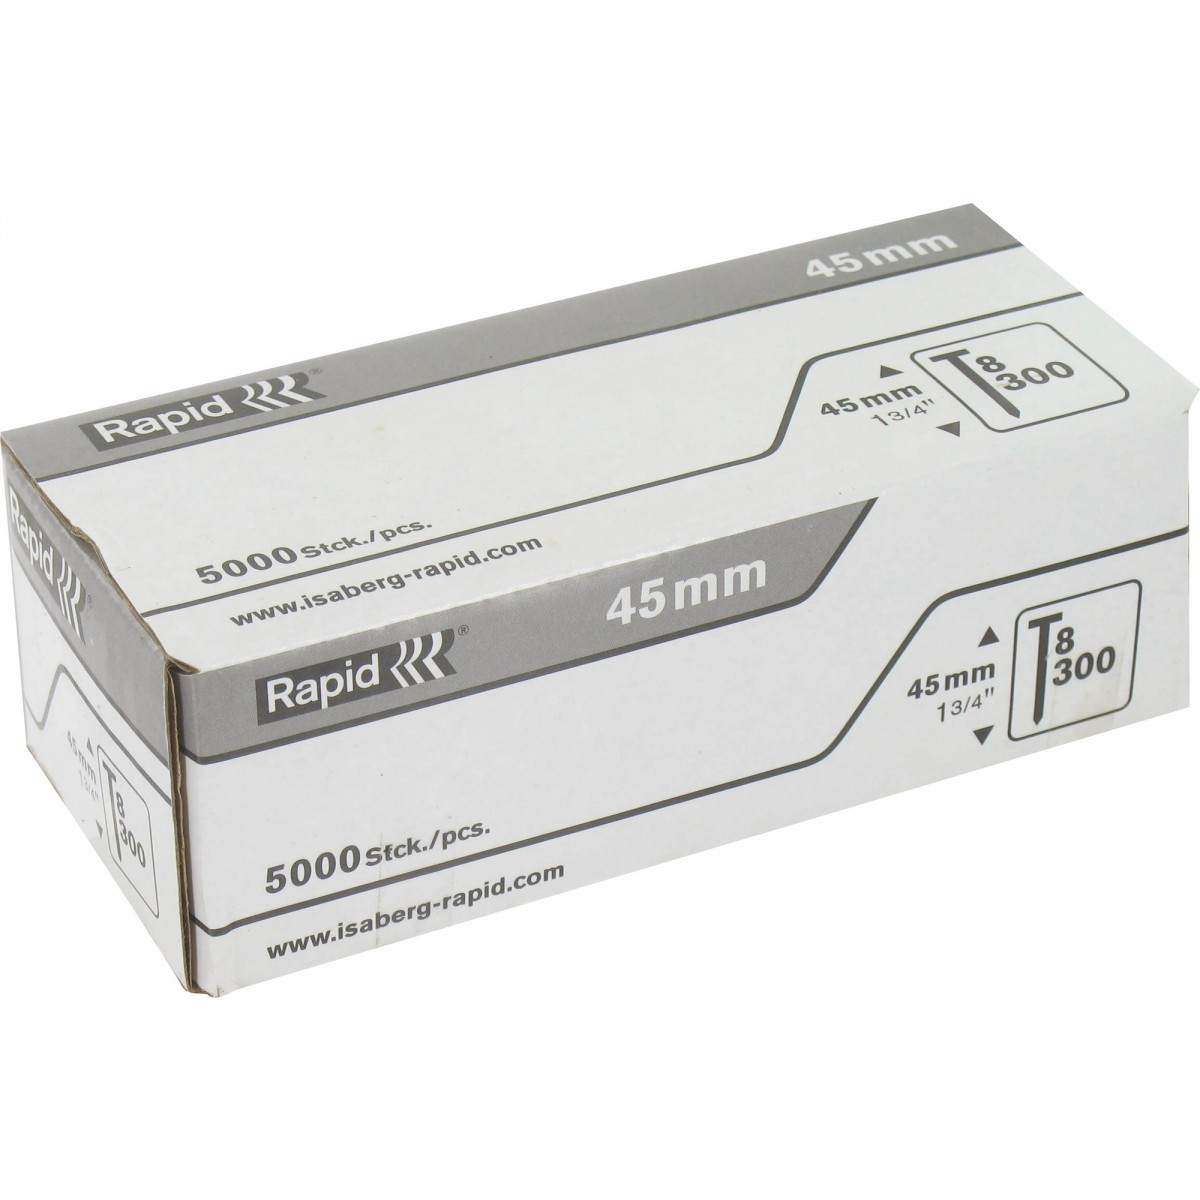 Pointe n°8 Rapid Agraf - Hauteur 45 mm - 5000 pointes